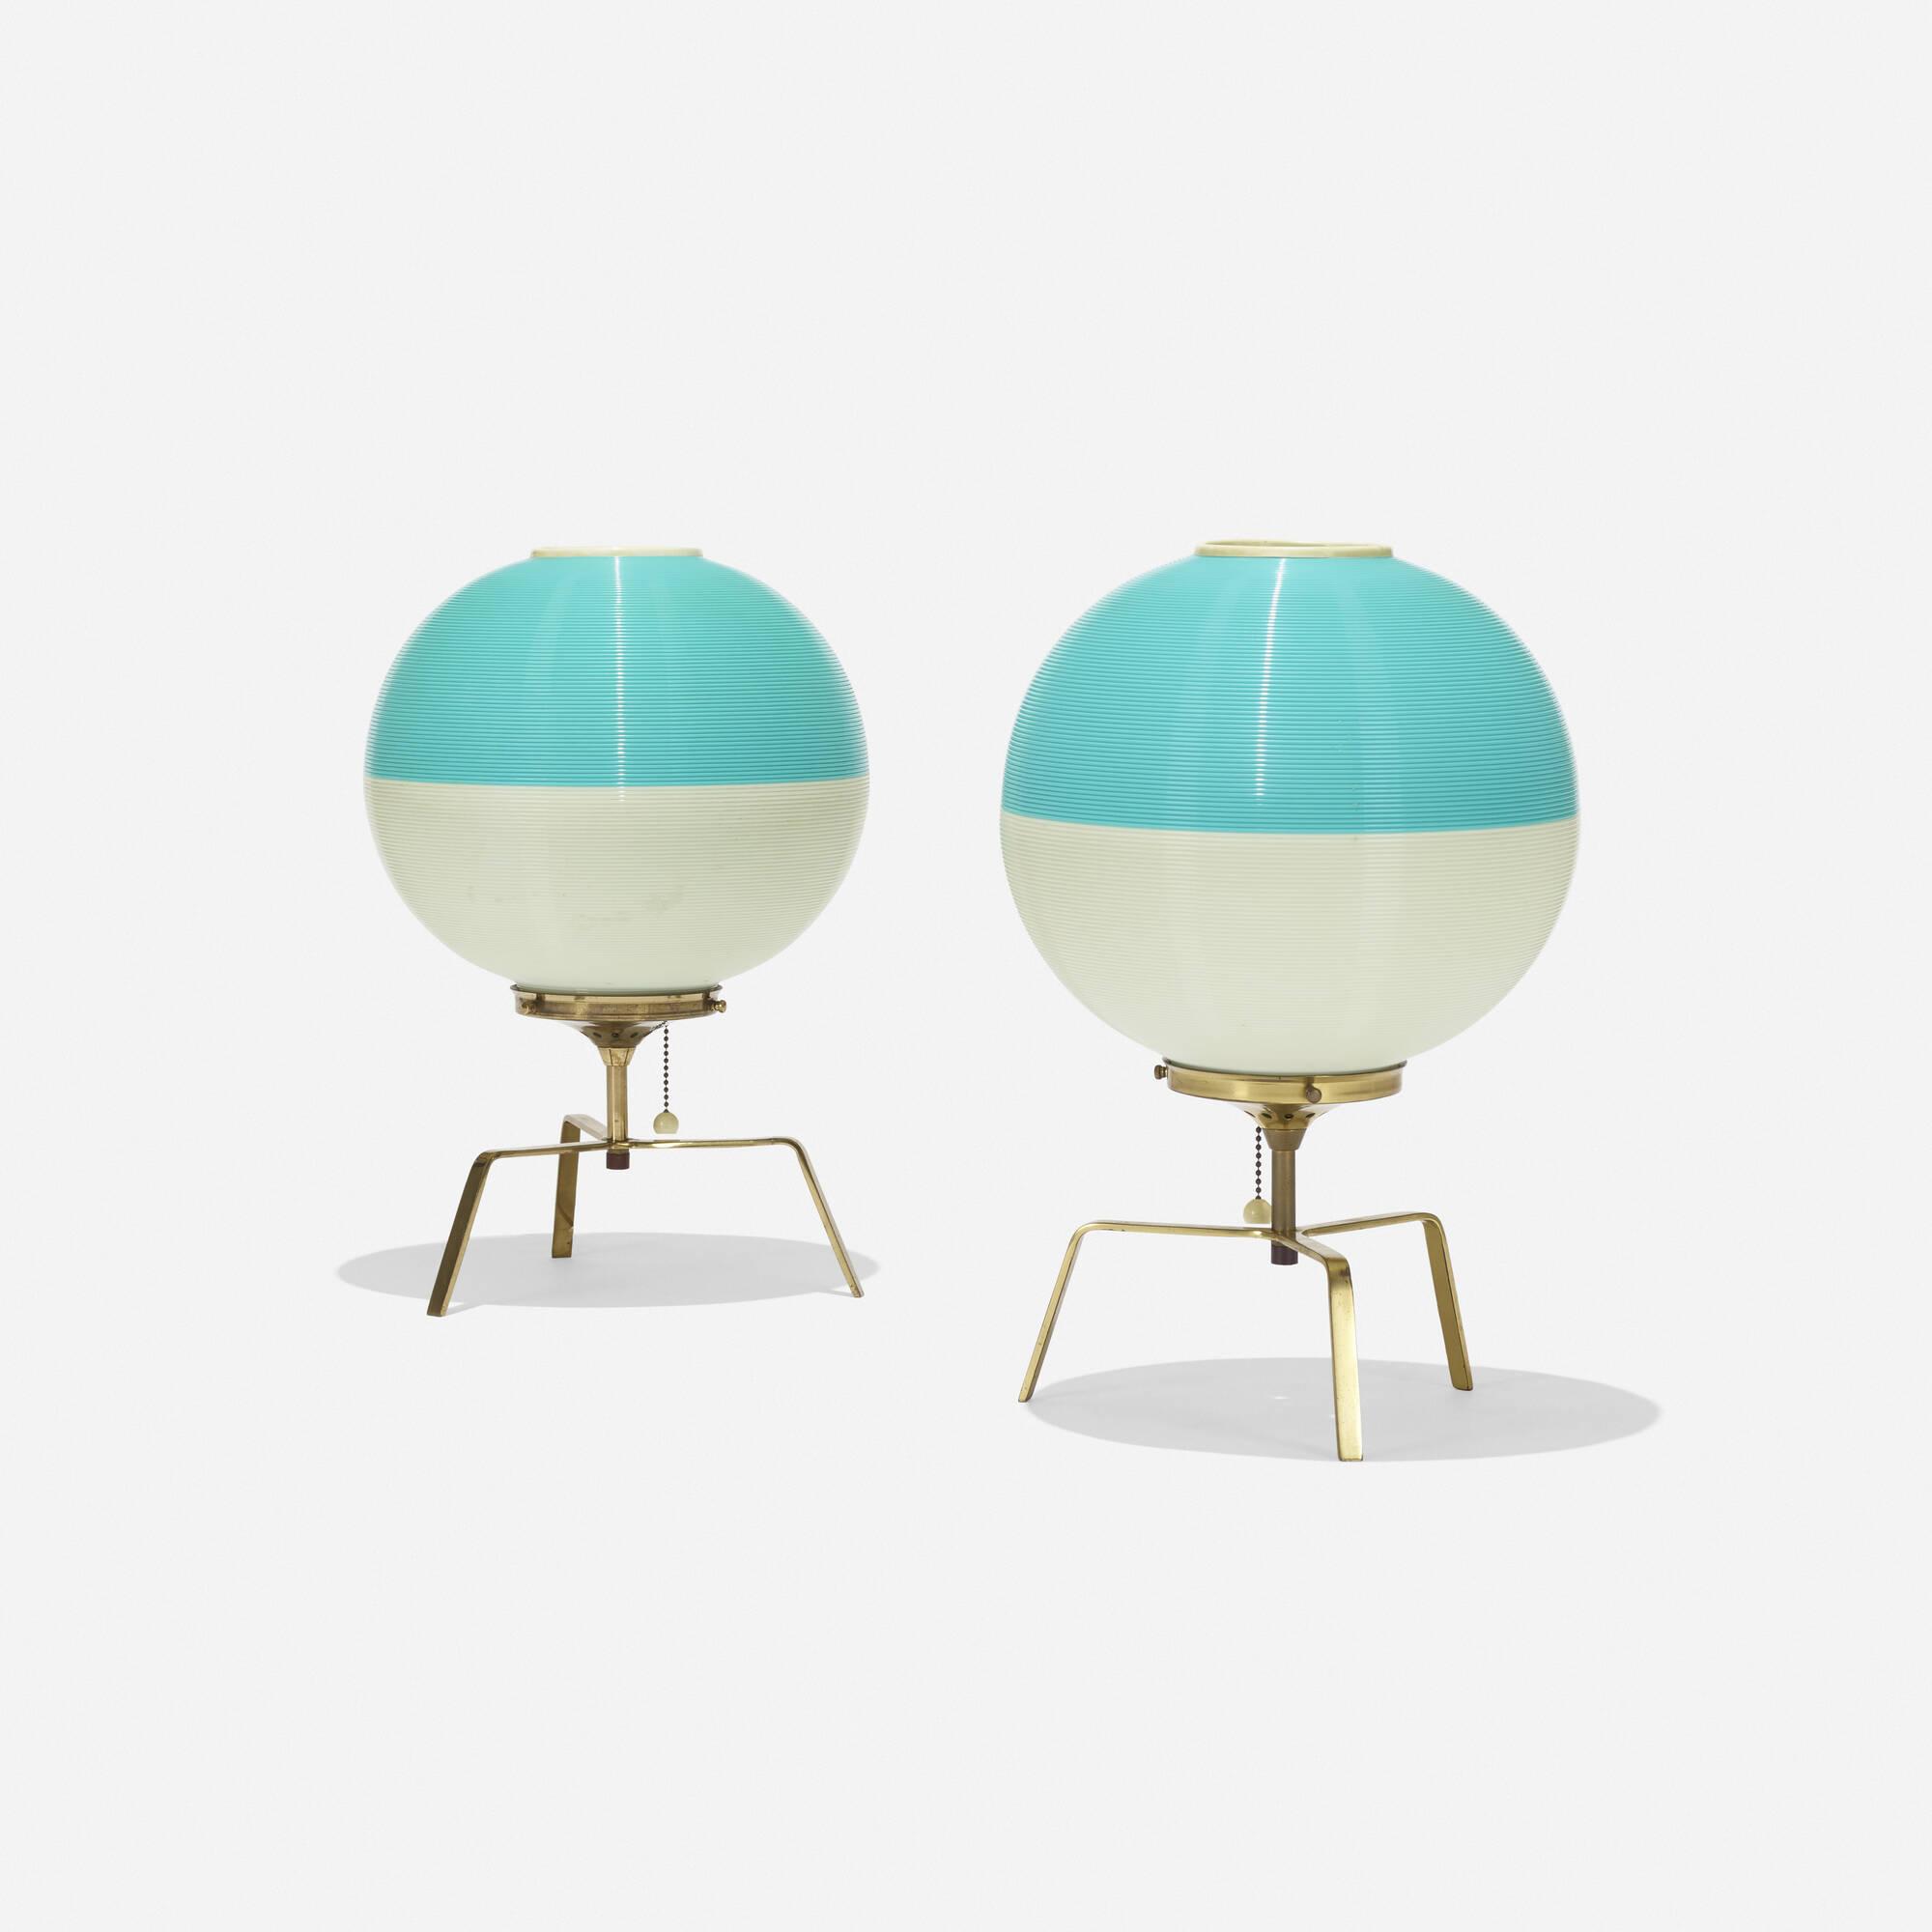 140: Yasha Heifetz / Rotaflex table lamps, pair (2 of 2)